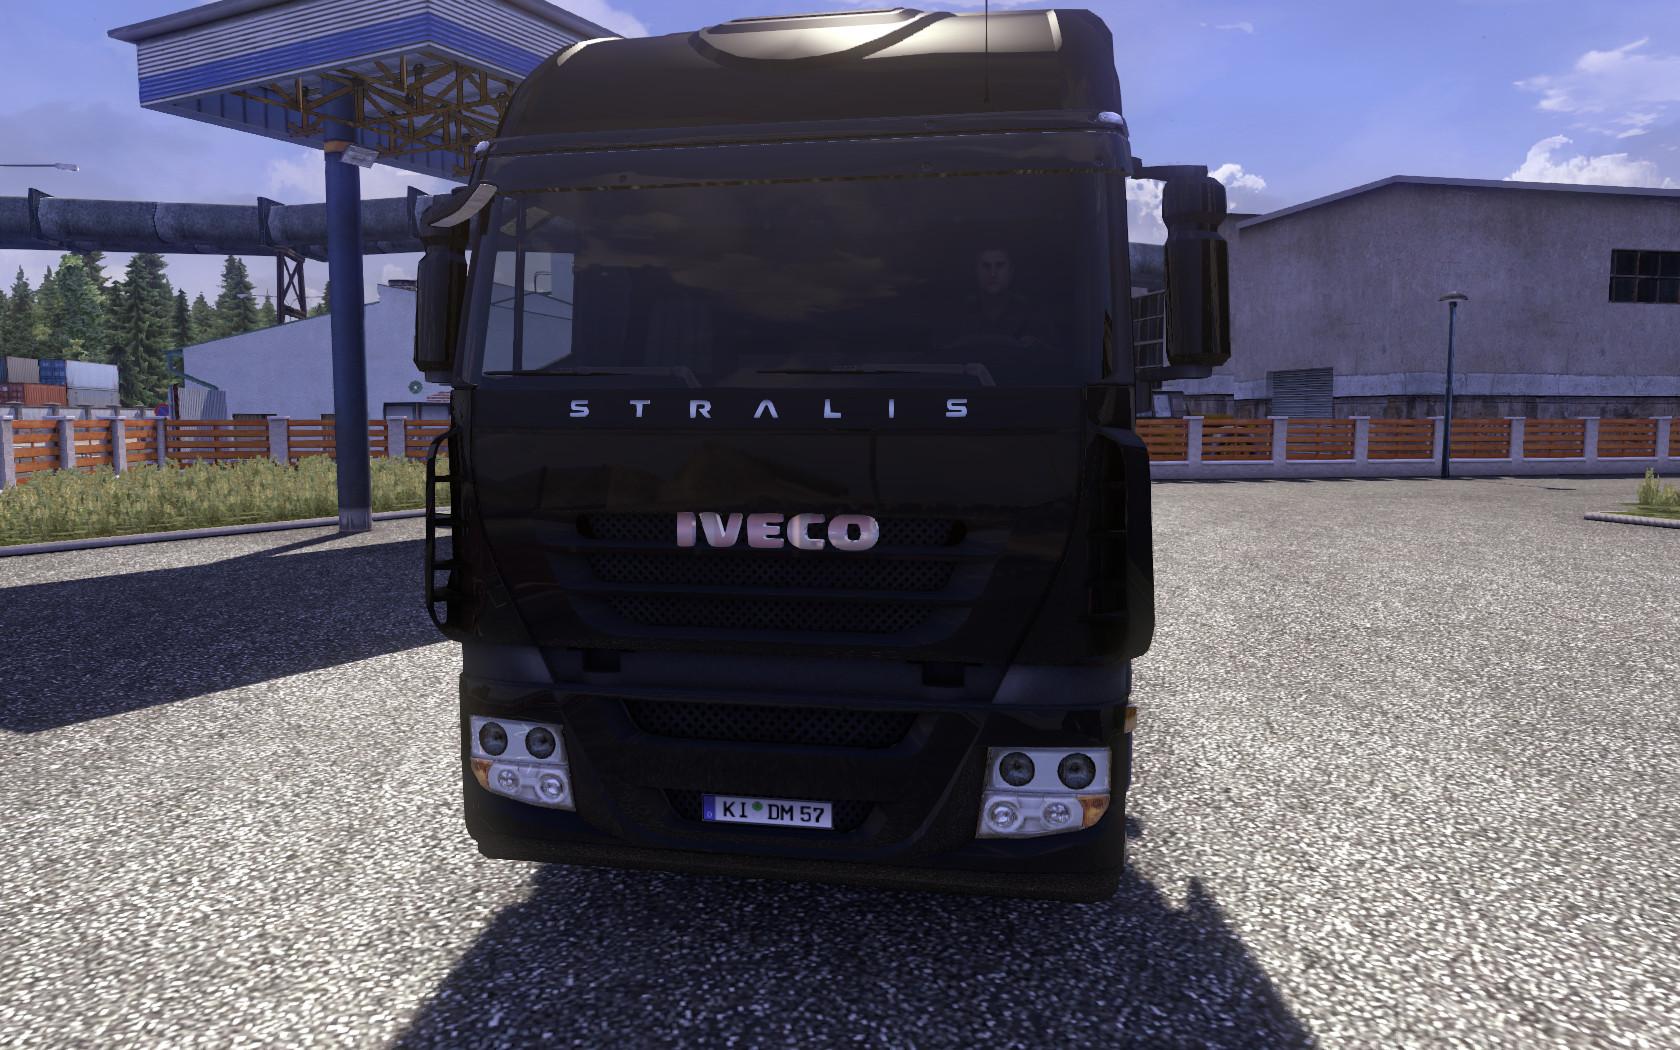 [Sammelthread] Euro Truck Simulator 2 [Reifenupdate + Reale Reifen DLC geteasert]-ets2_00145.jpg